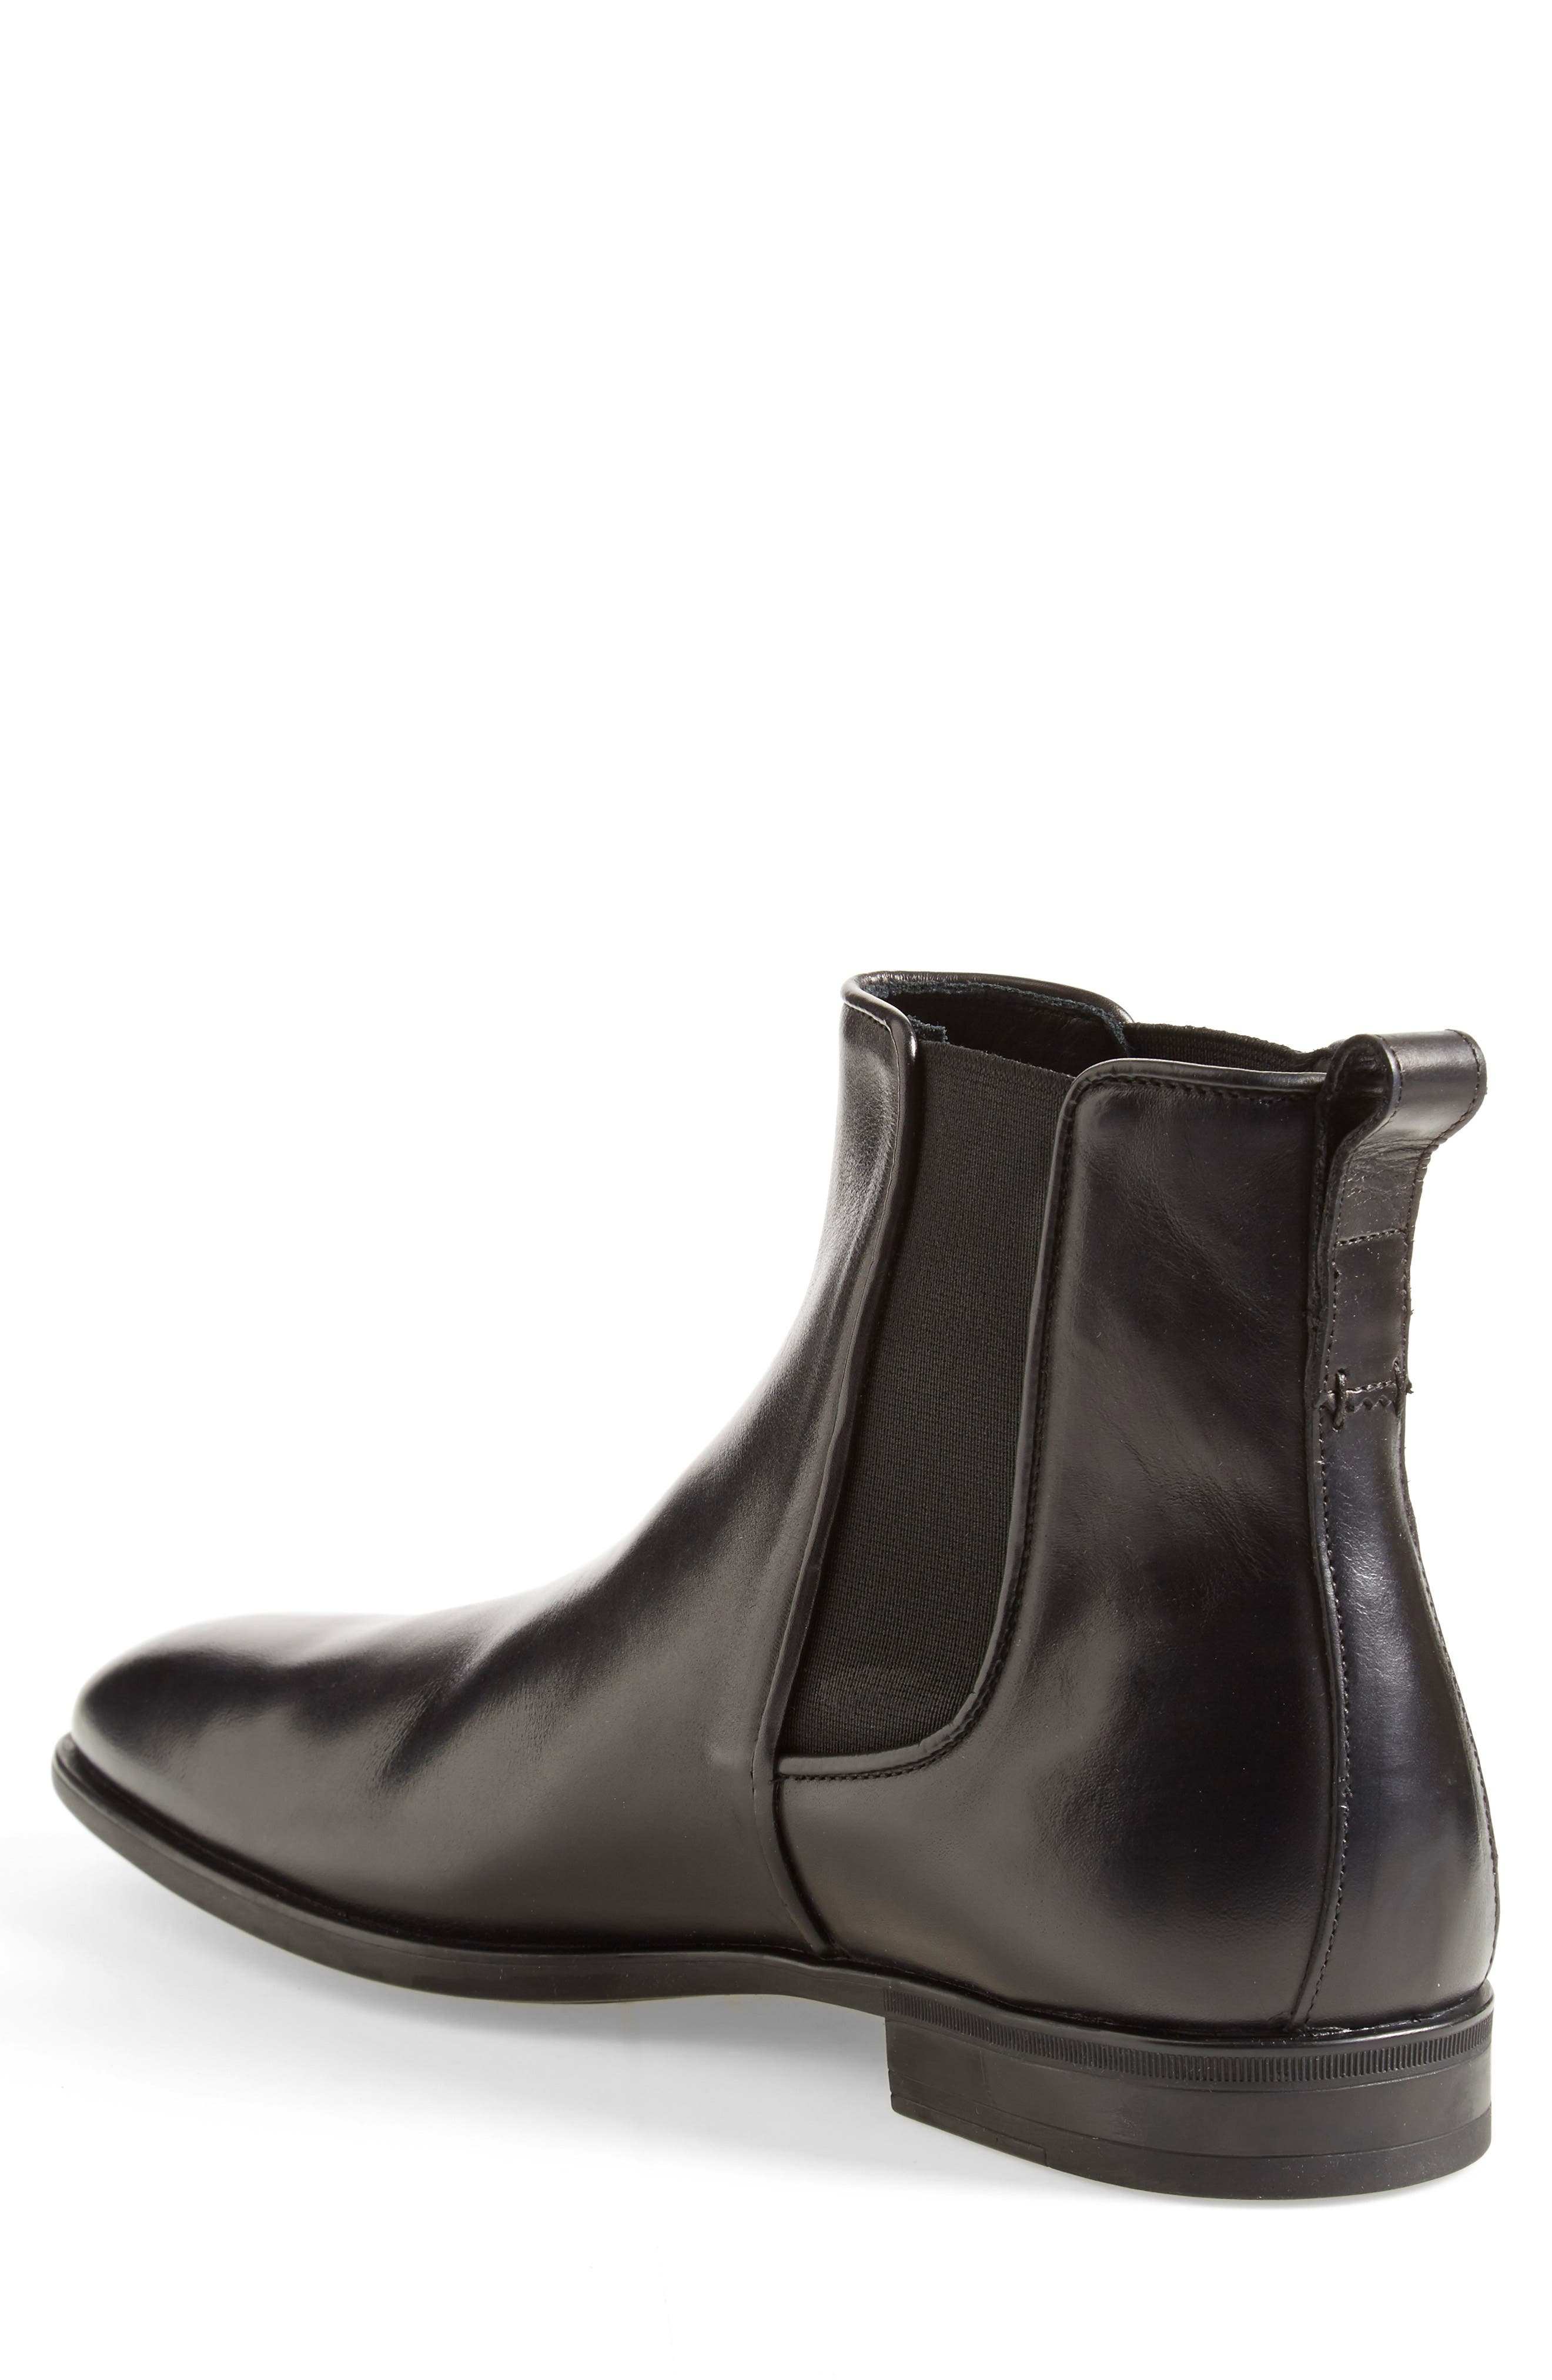 'Adrian' Weatherproof Chelsea Boot,                             Main thumbnail 2, color,